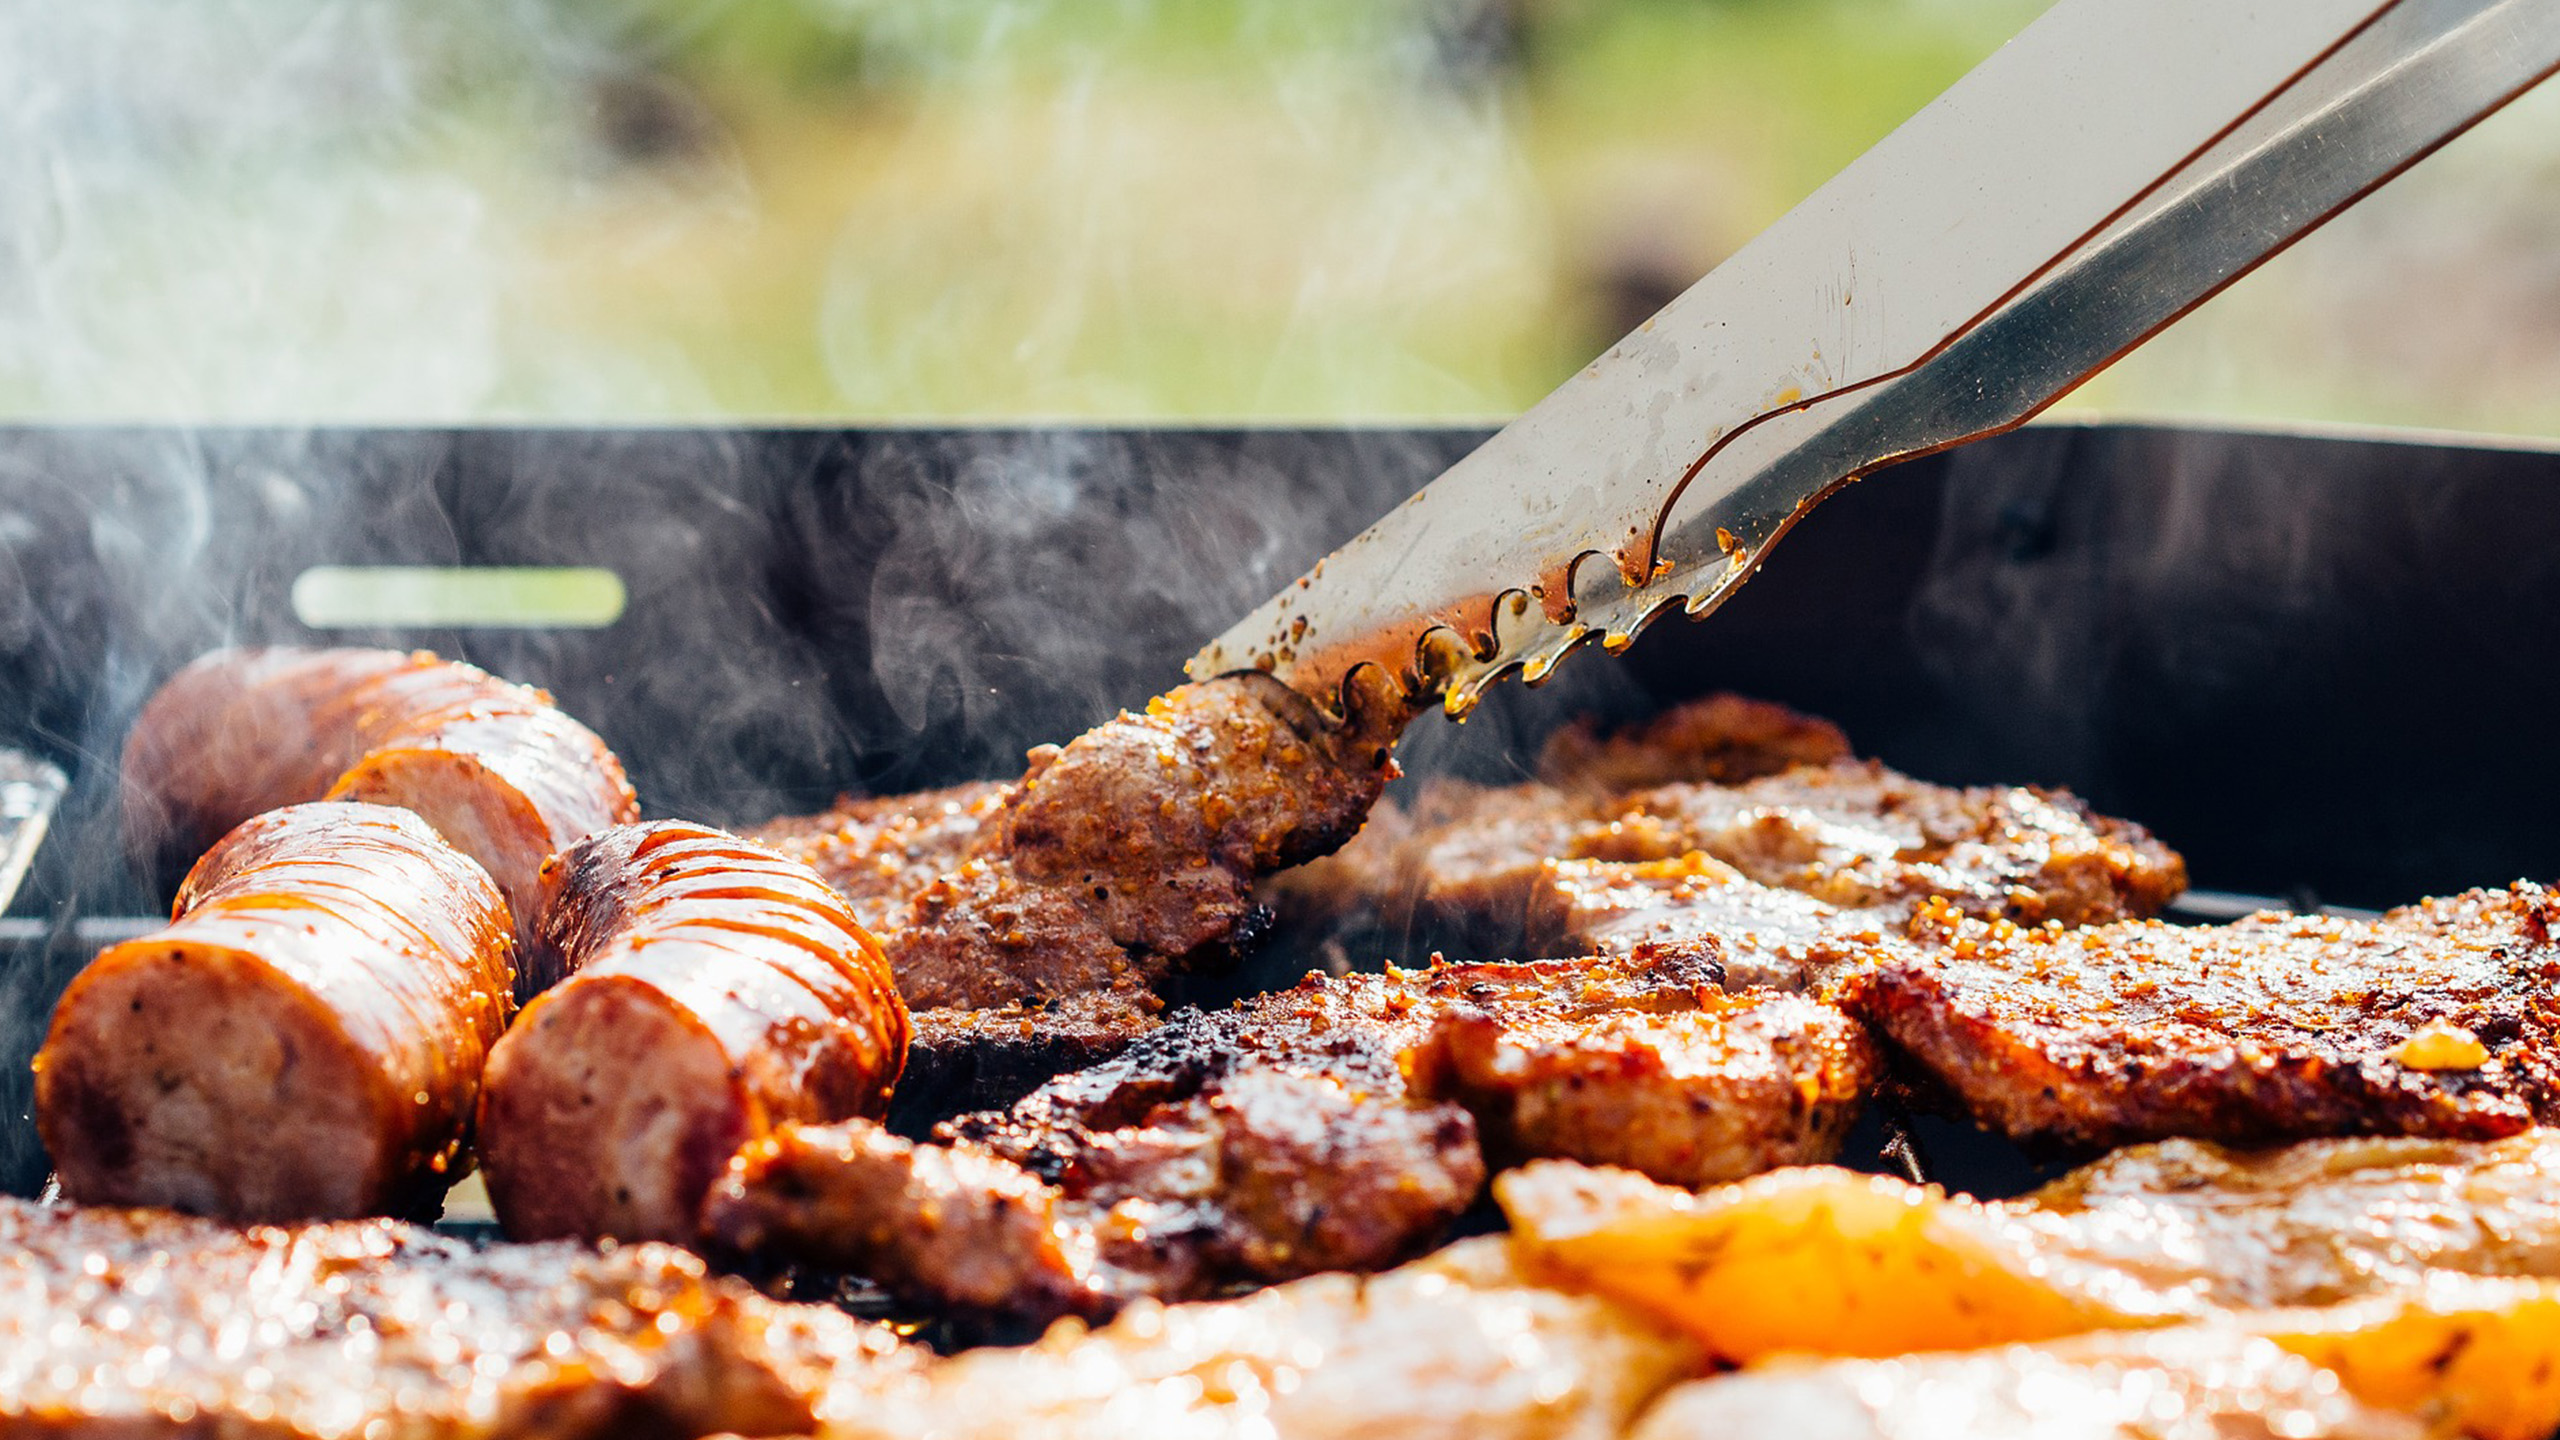 carne-asada-salchichas-grill